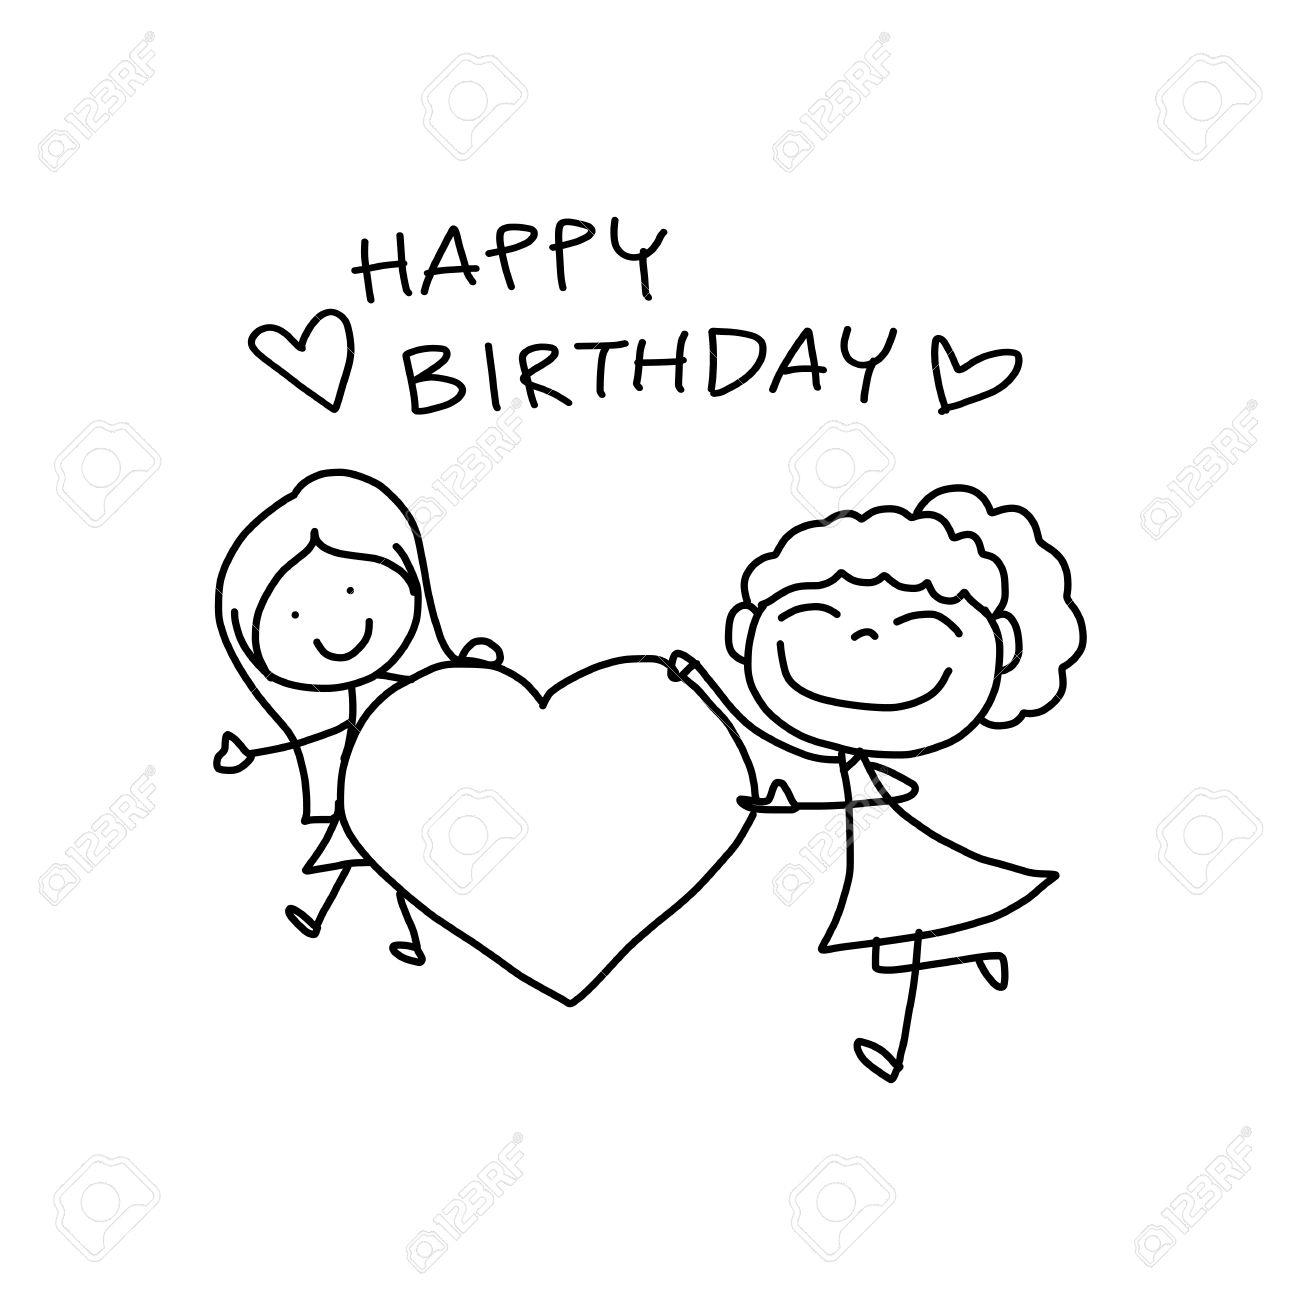 1300x1300 Drawing Of Happy Birthday